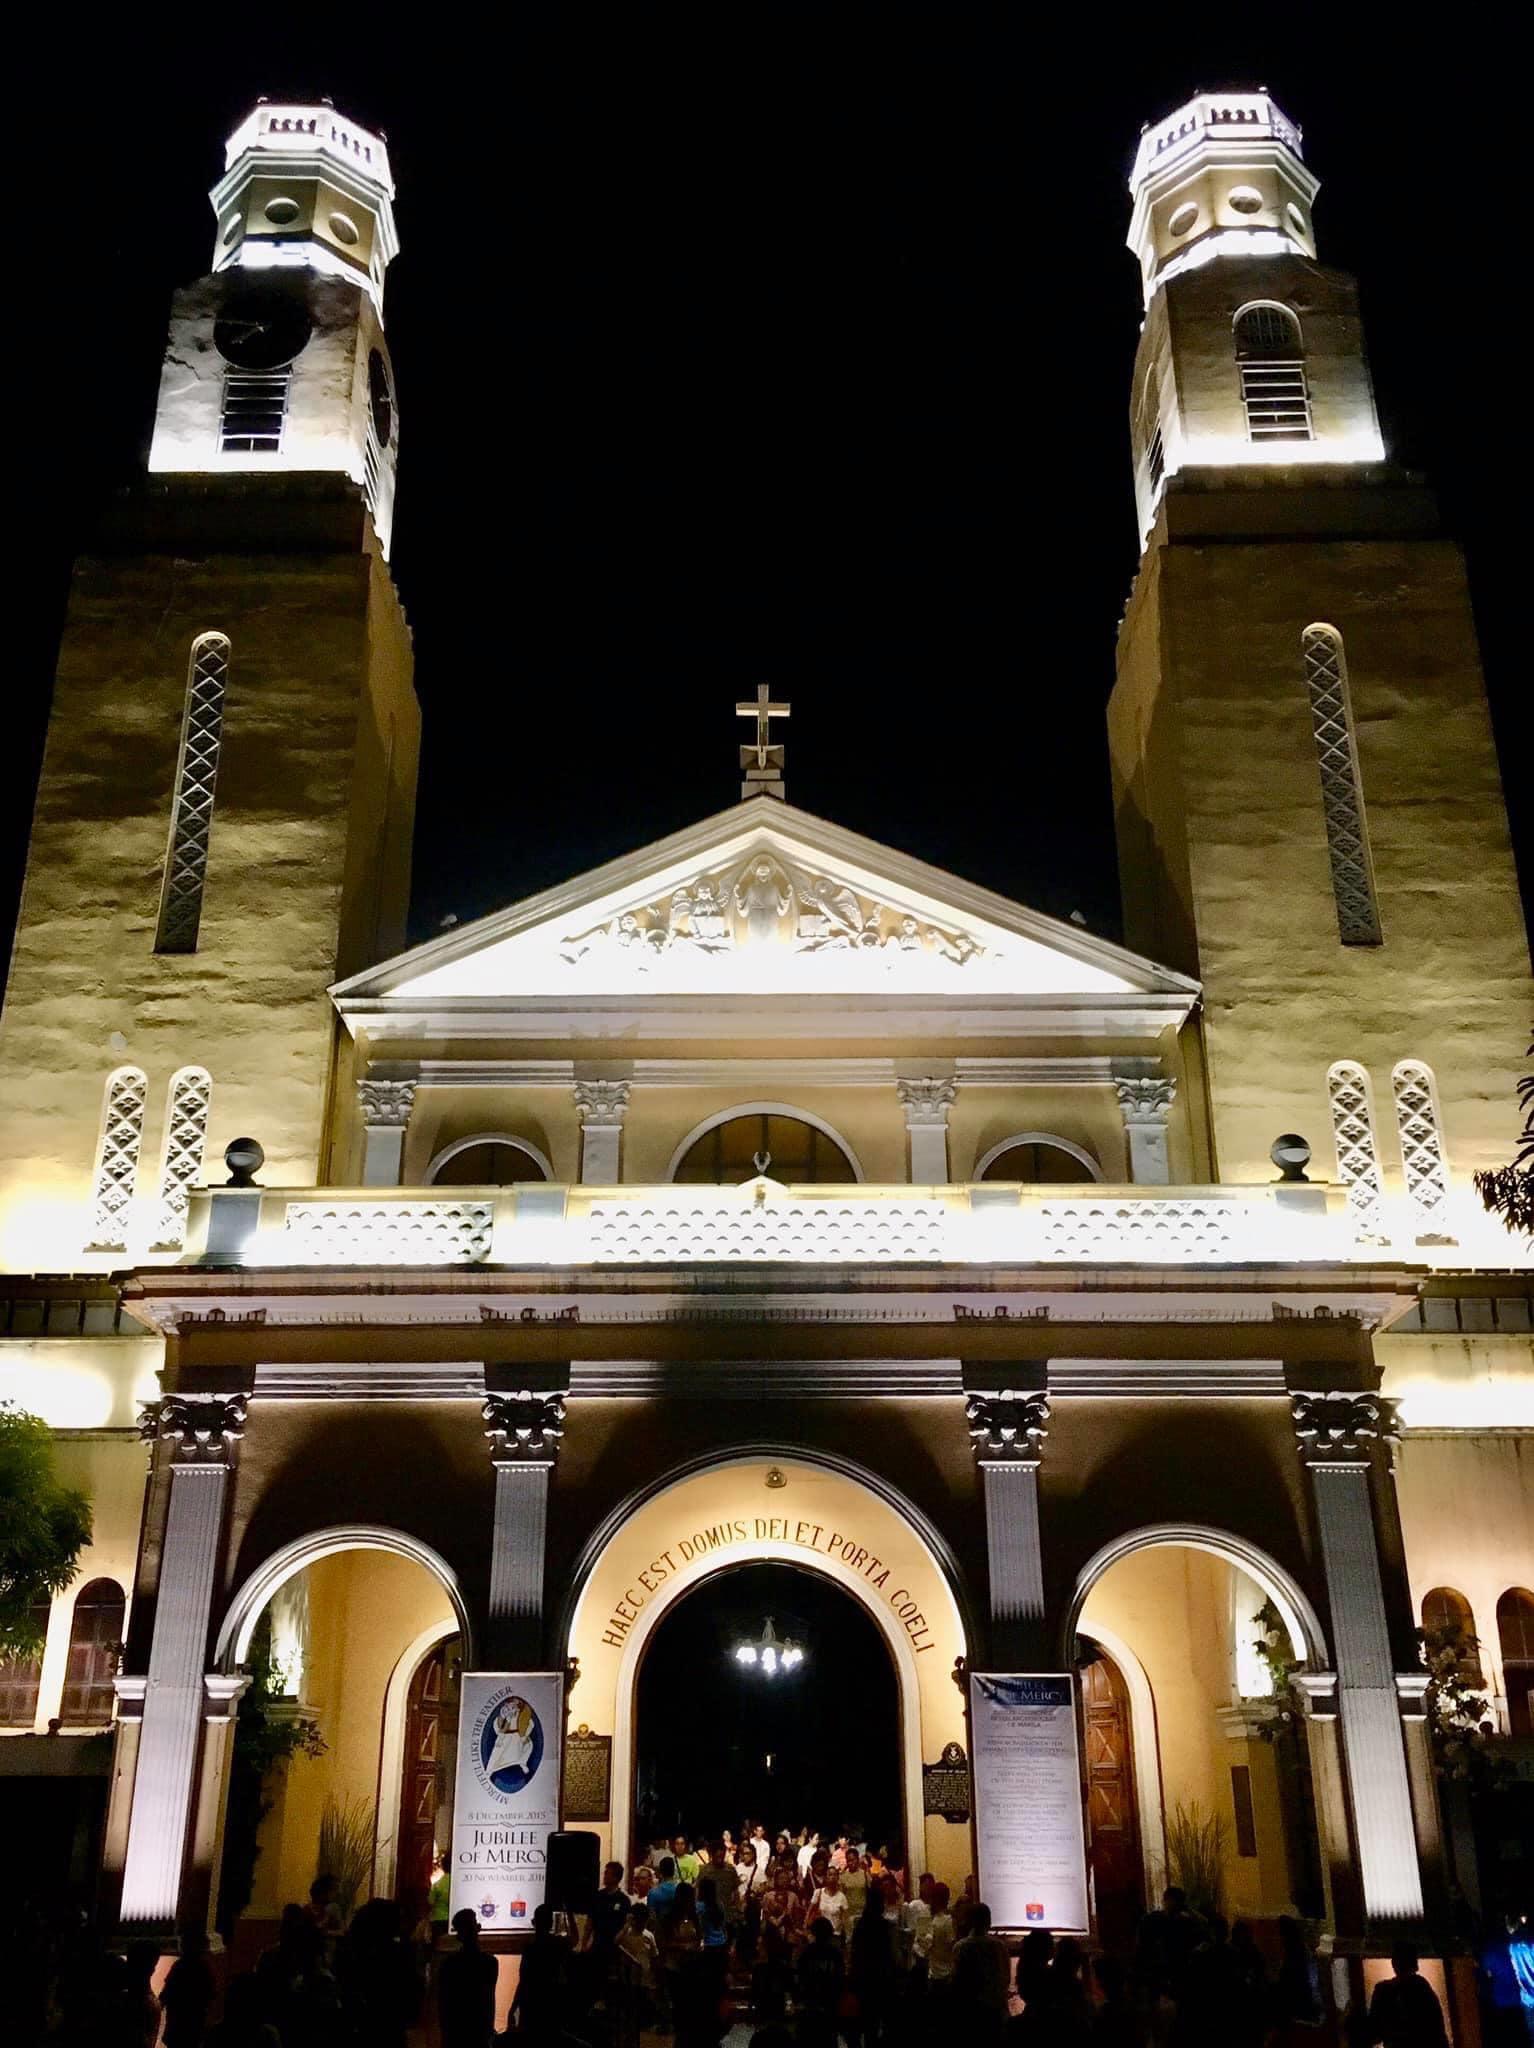 The town church of San Fernando or Paco at present.